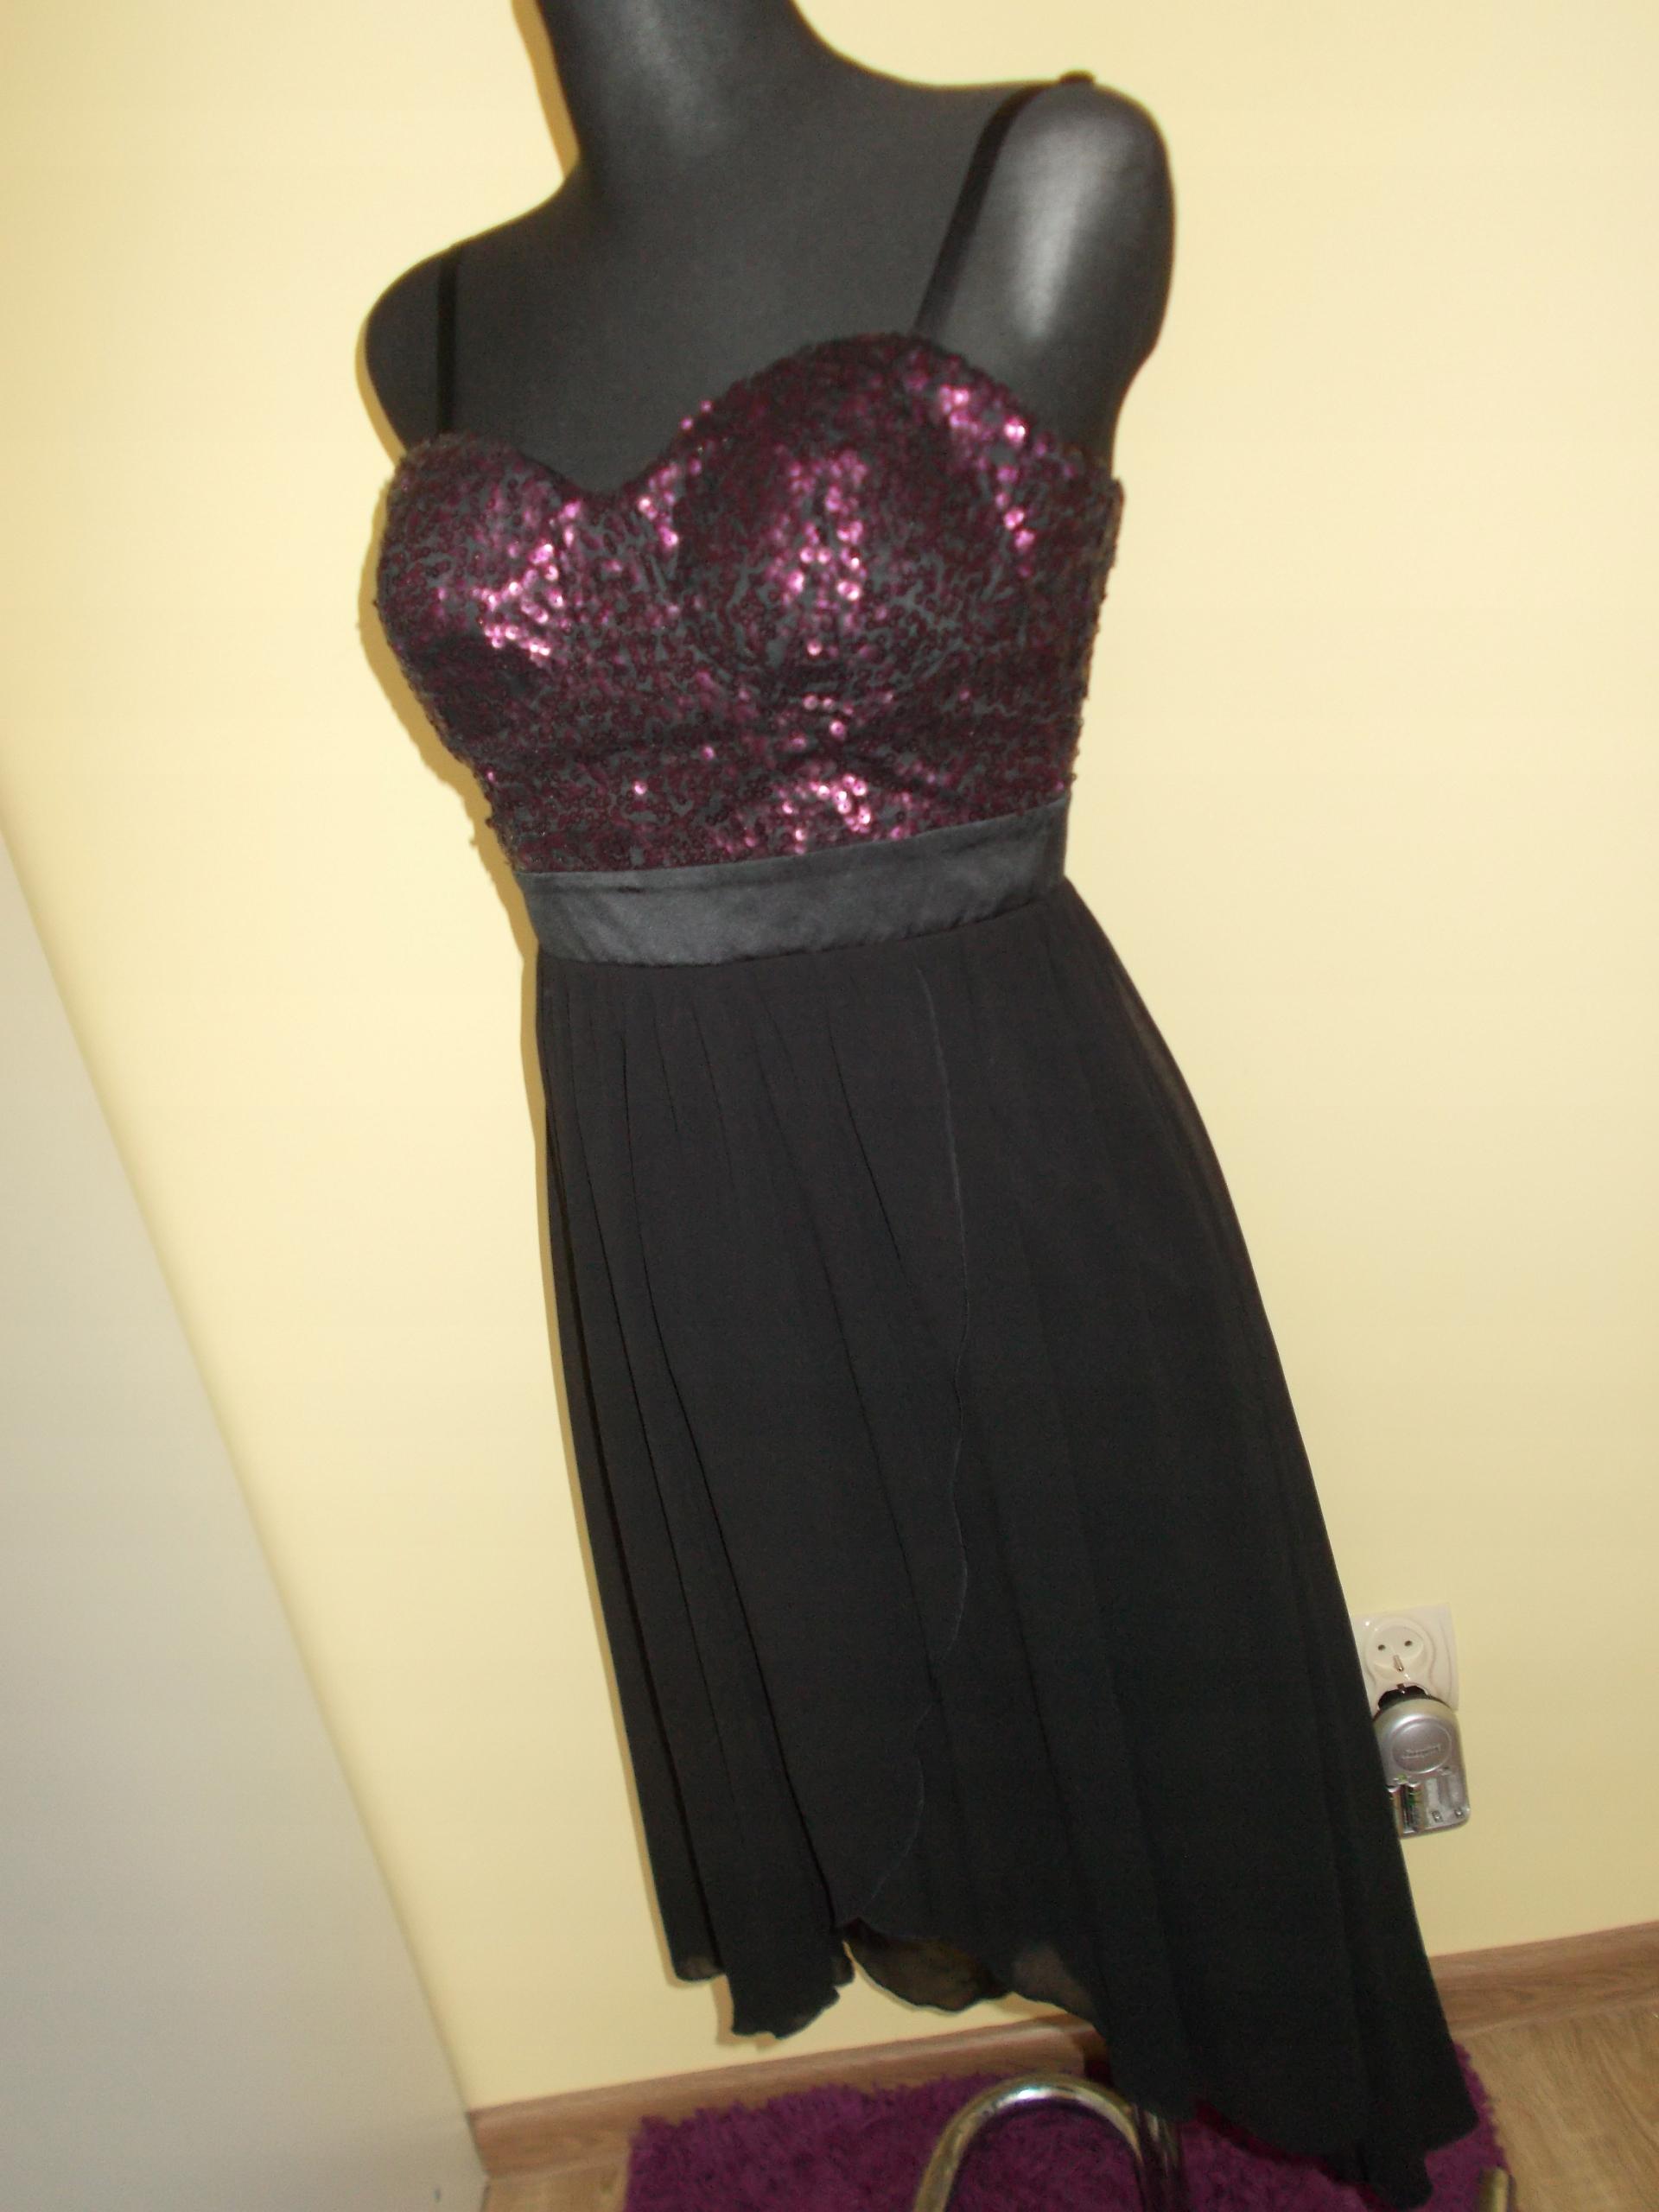 95b13ba773 Lipsy asymetryczna sukienka cekiny glamour 38 - 7652851705 ...